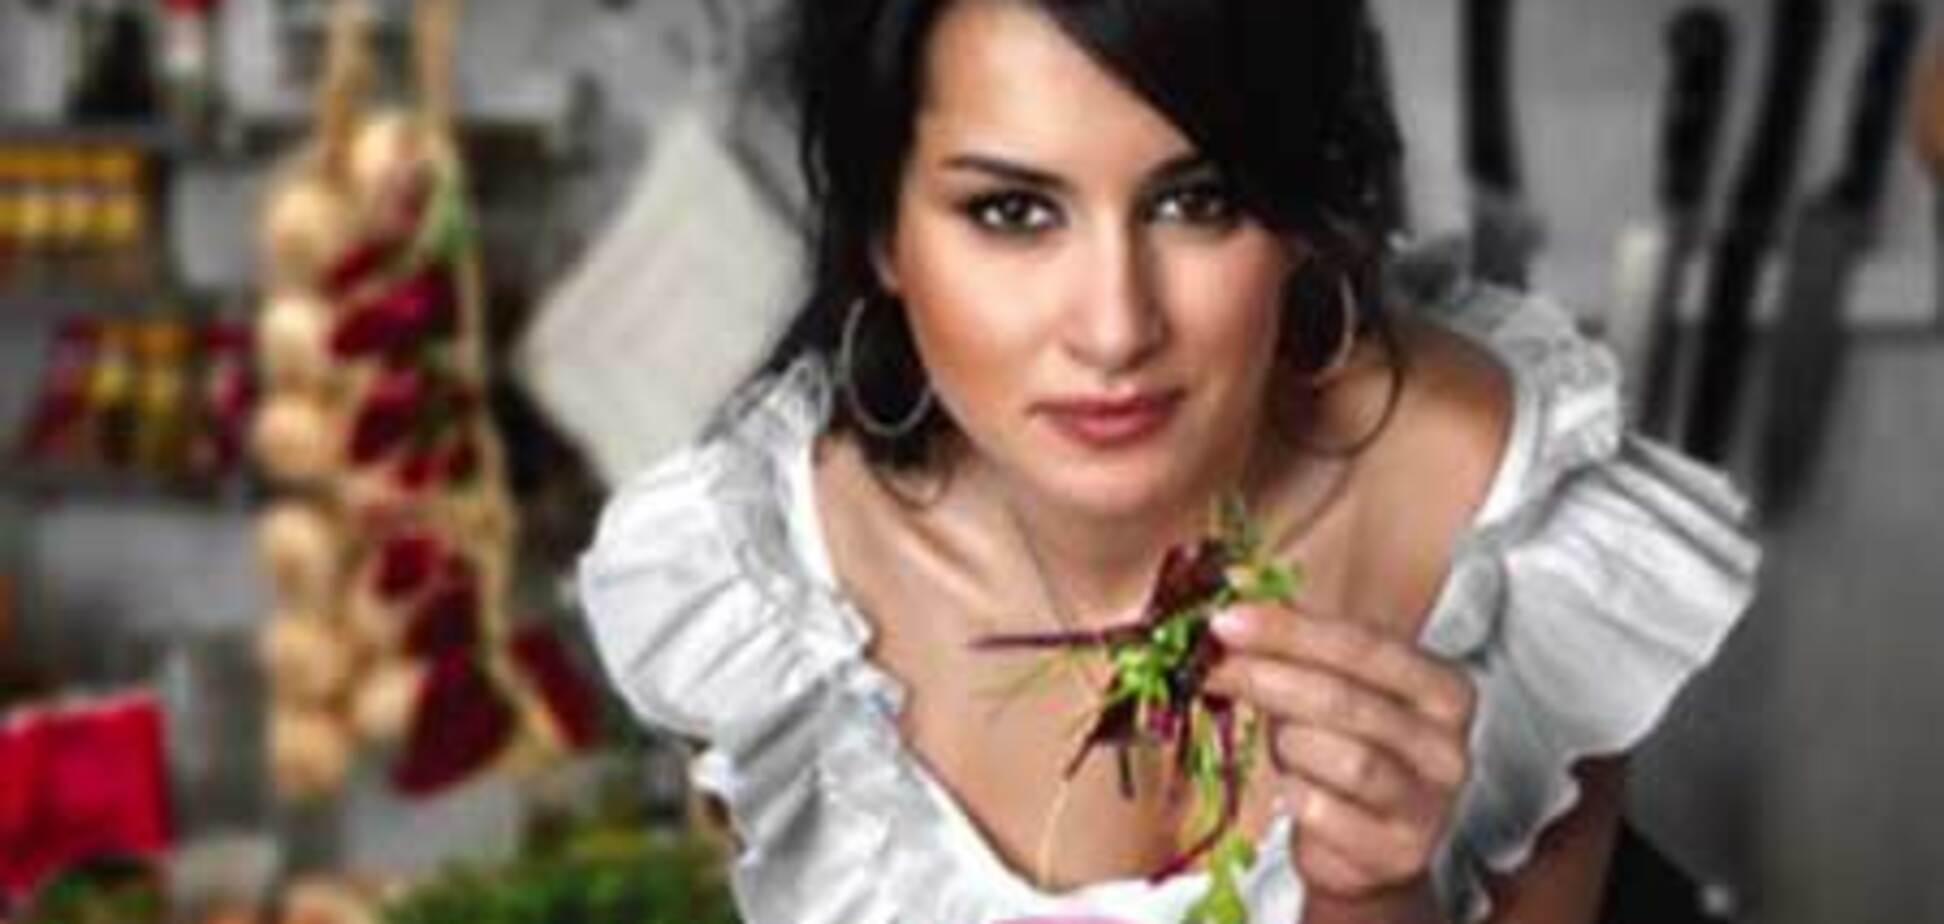 Тина Канделаки уплетает салат за деньги